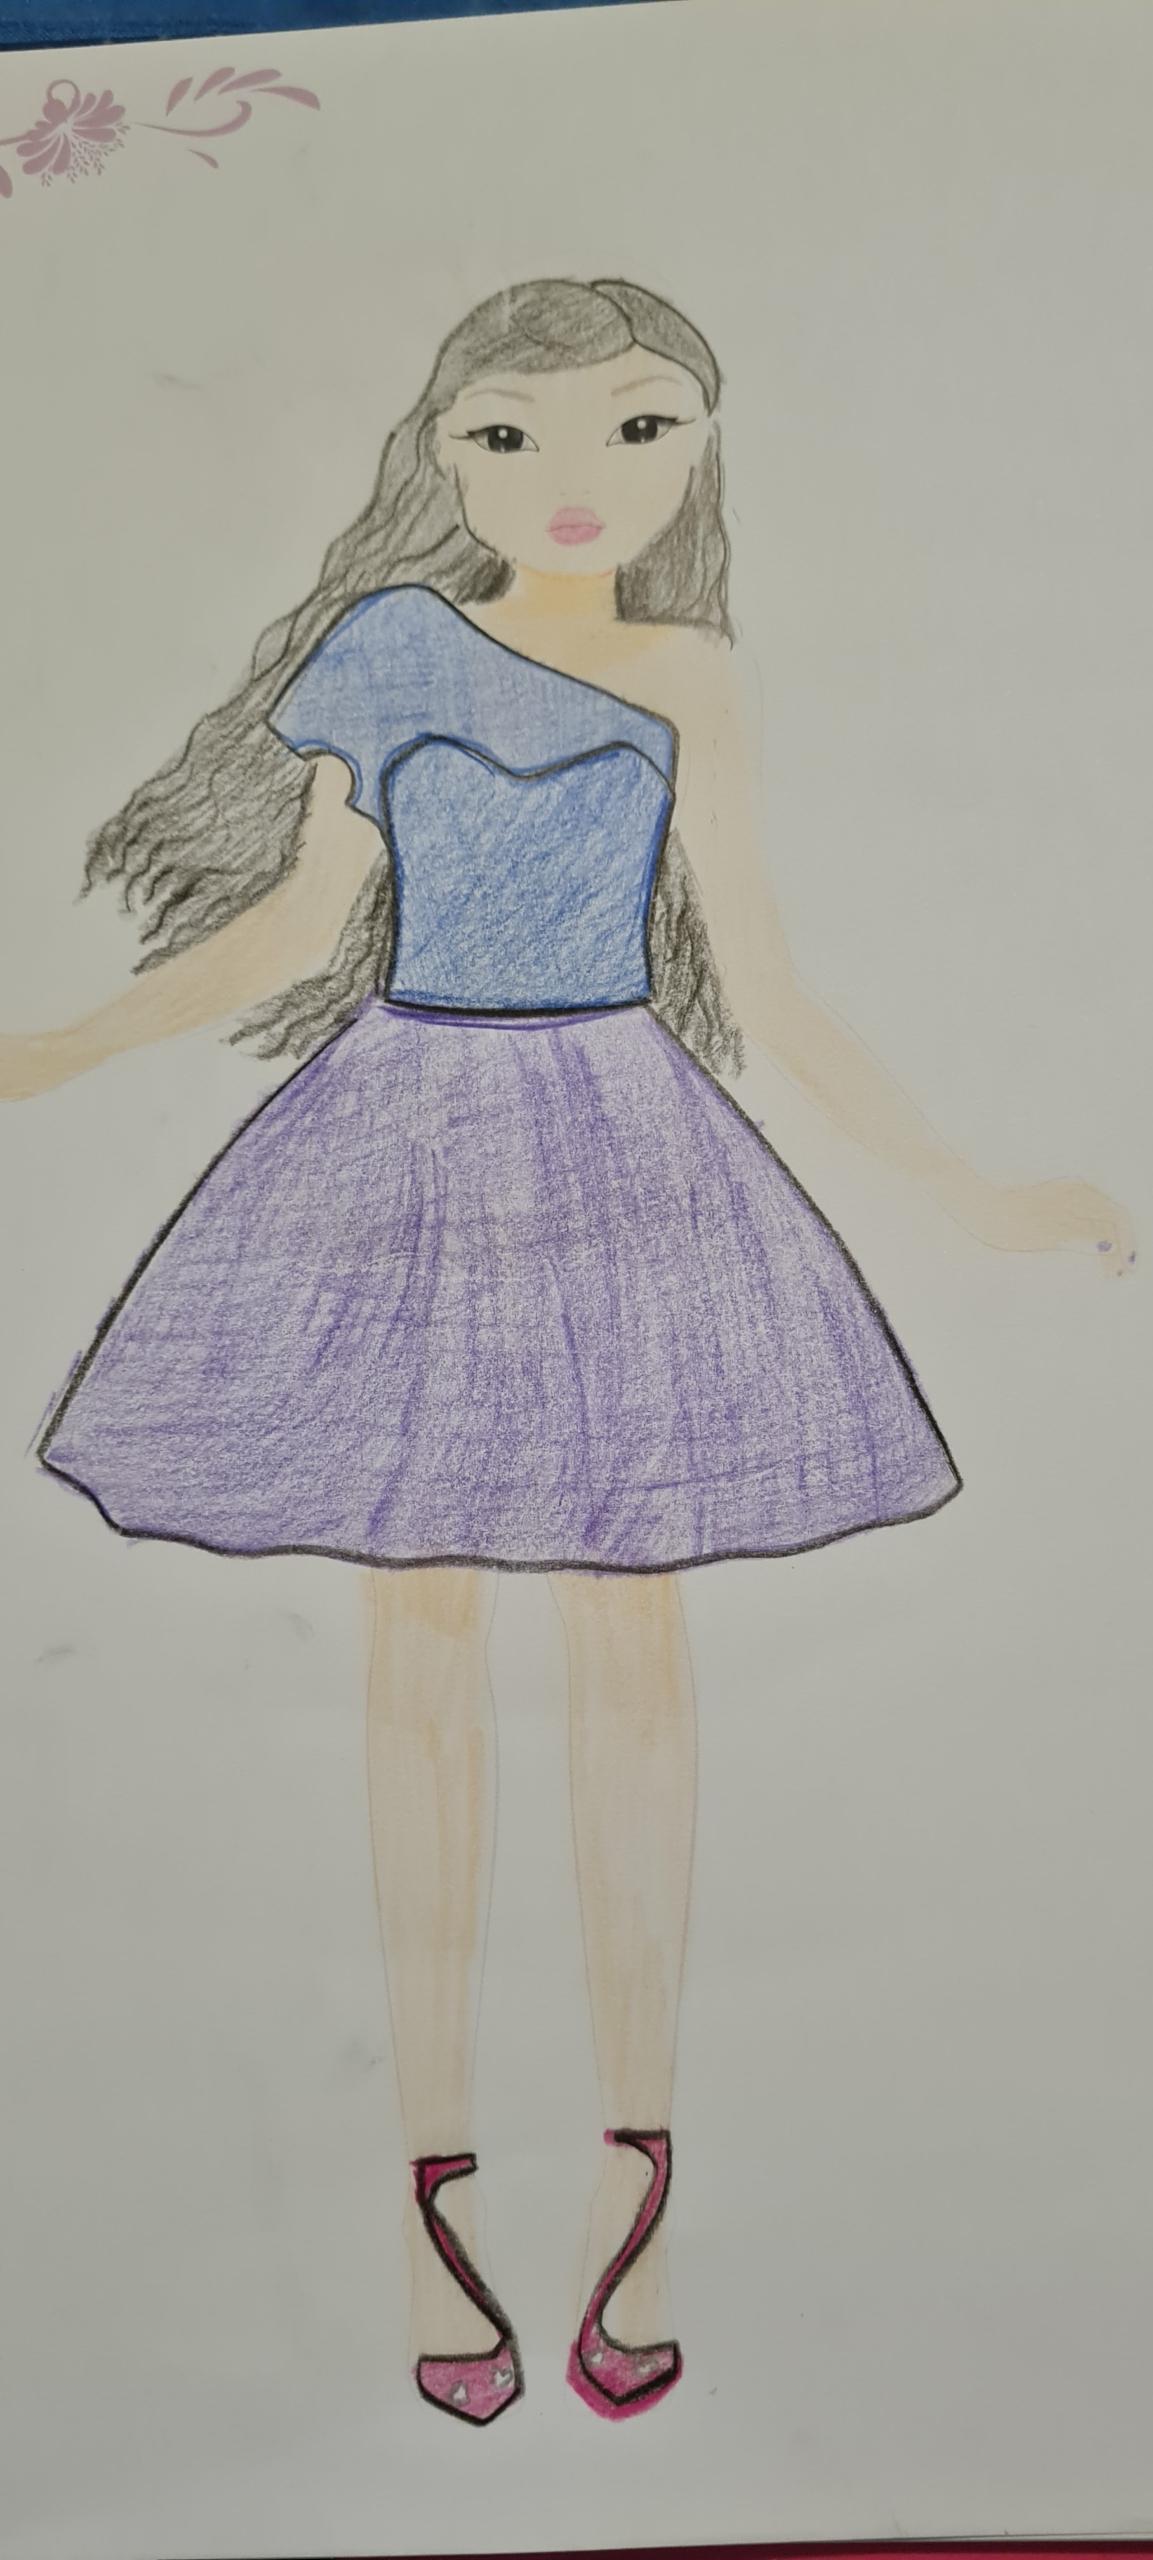 Adele Z., 9 Jahre, aus Italy